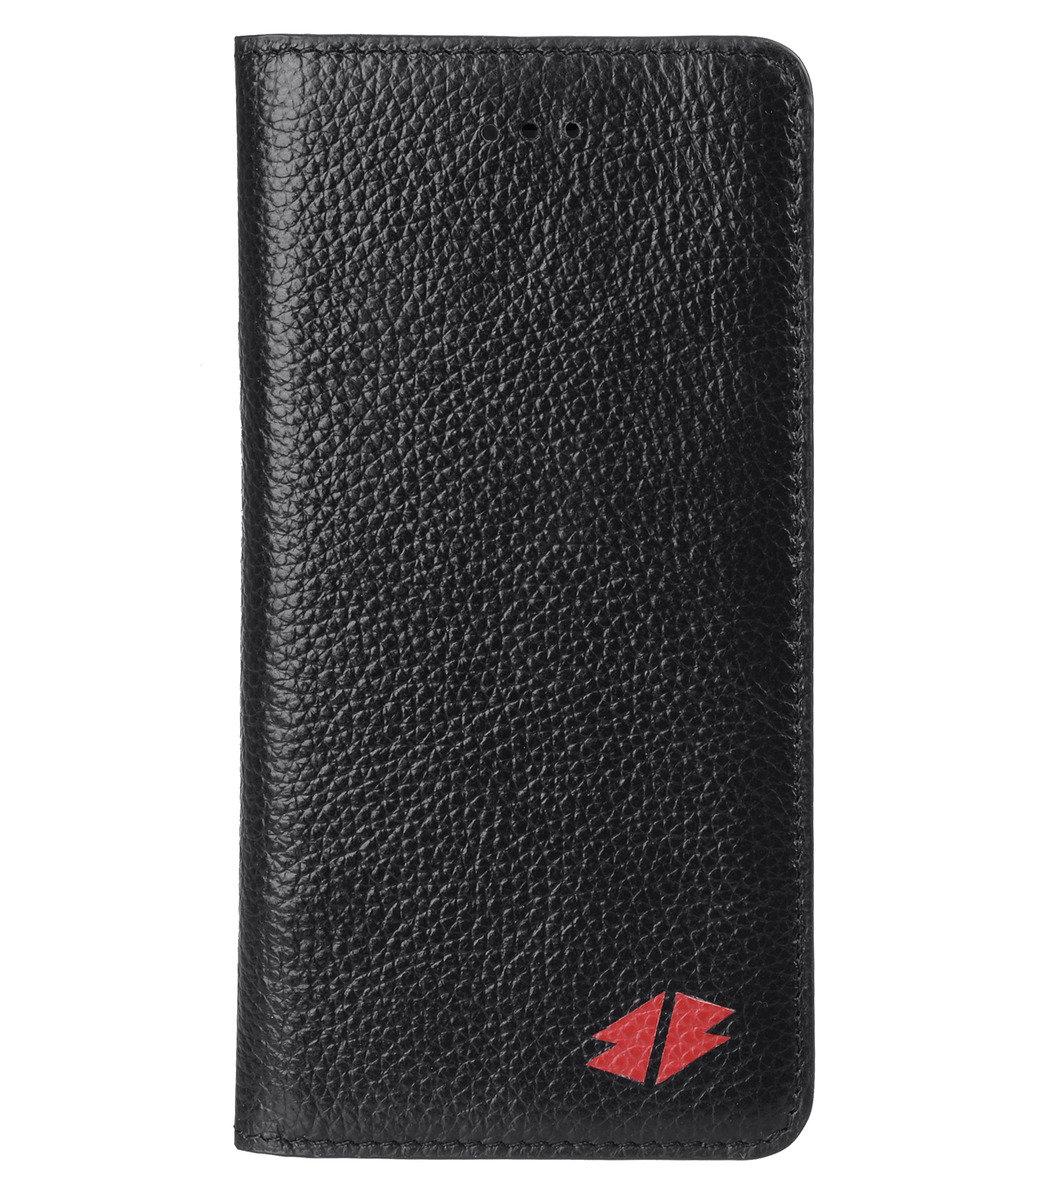 "Iphone 6/6s (4.7"") Herman系列 義大利牛皮手機套 (黑色荔枝條紋)"